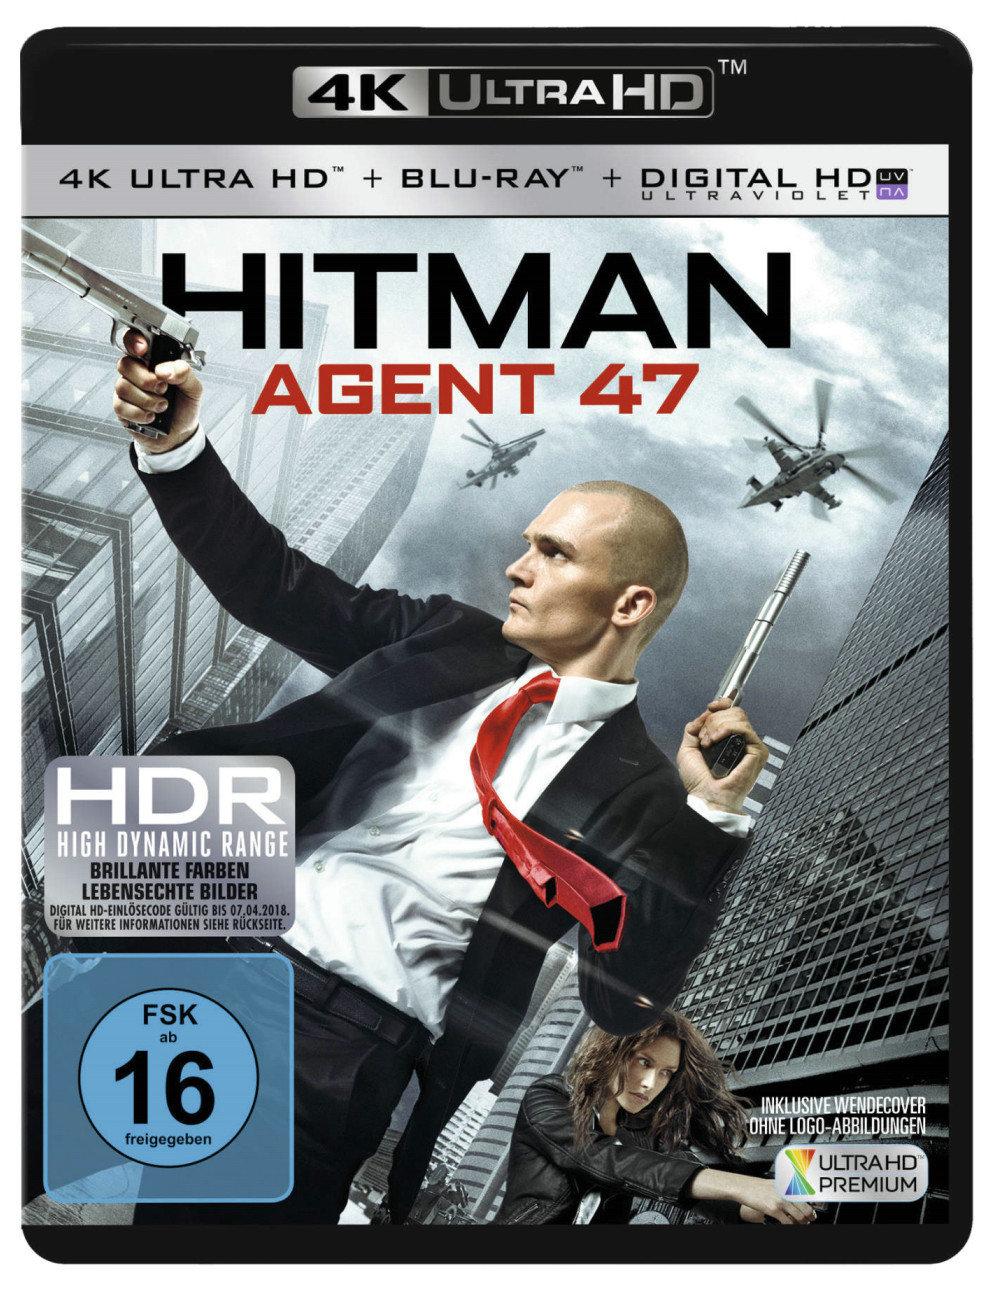 Hitman - Agent 47 4K (2015) - (4K Ultra HD & Blu-ray)